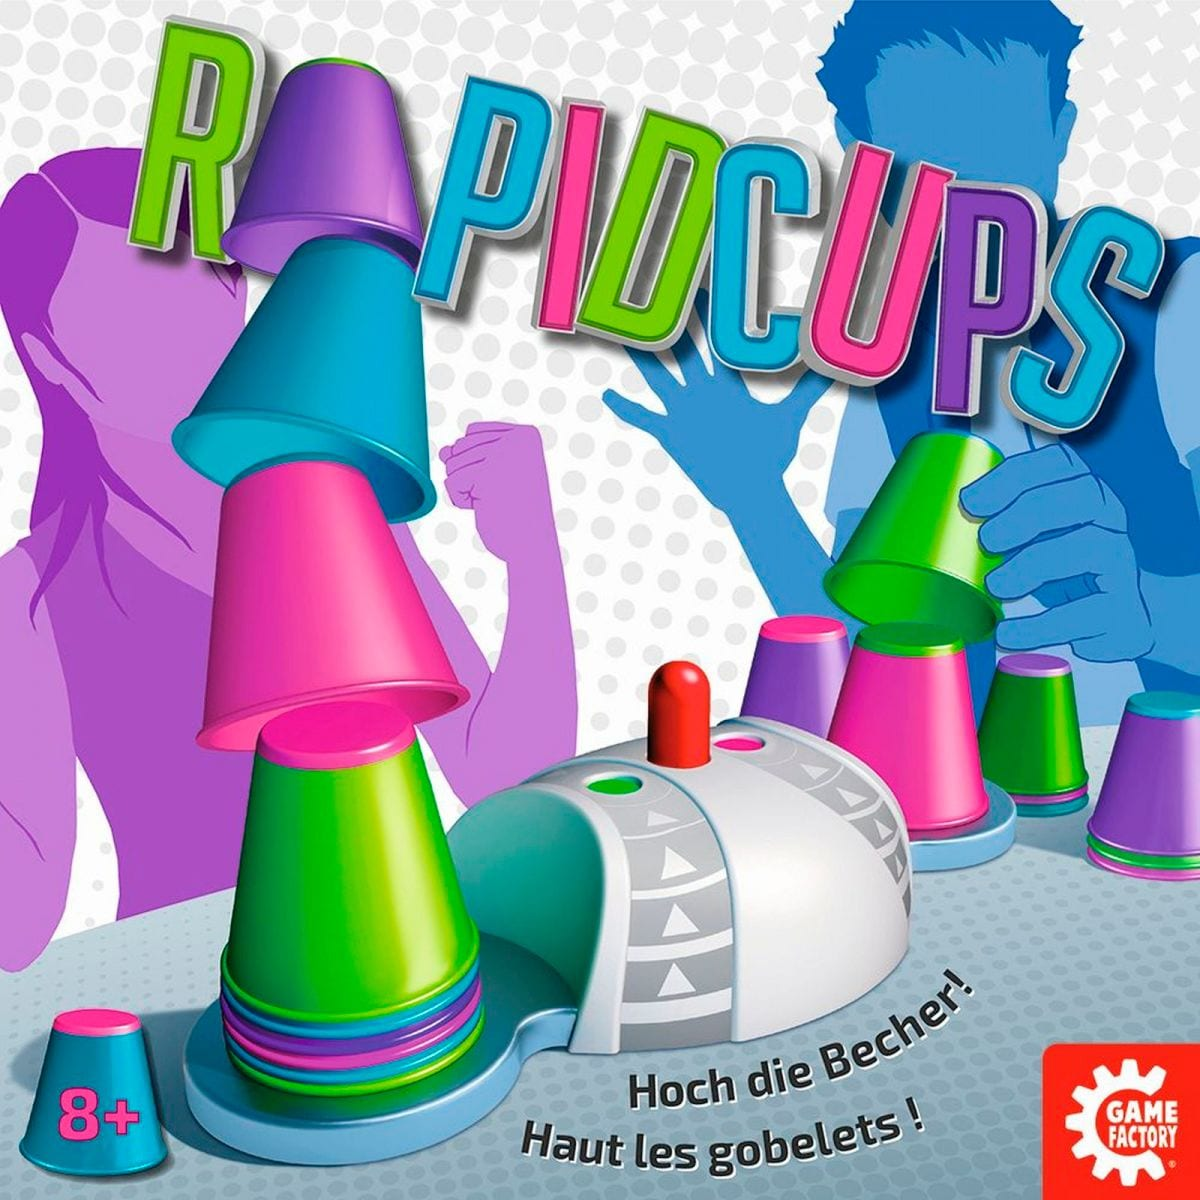 Rapid Cups Gesellschaftsspiel